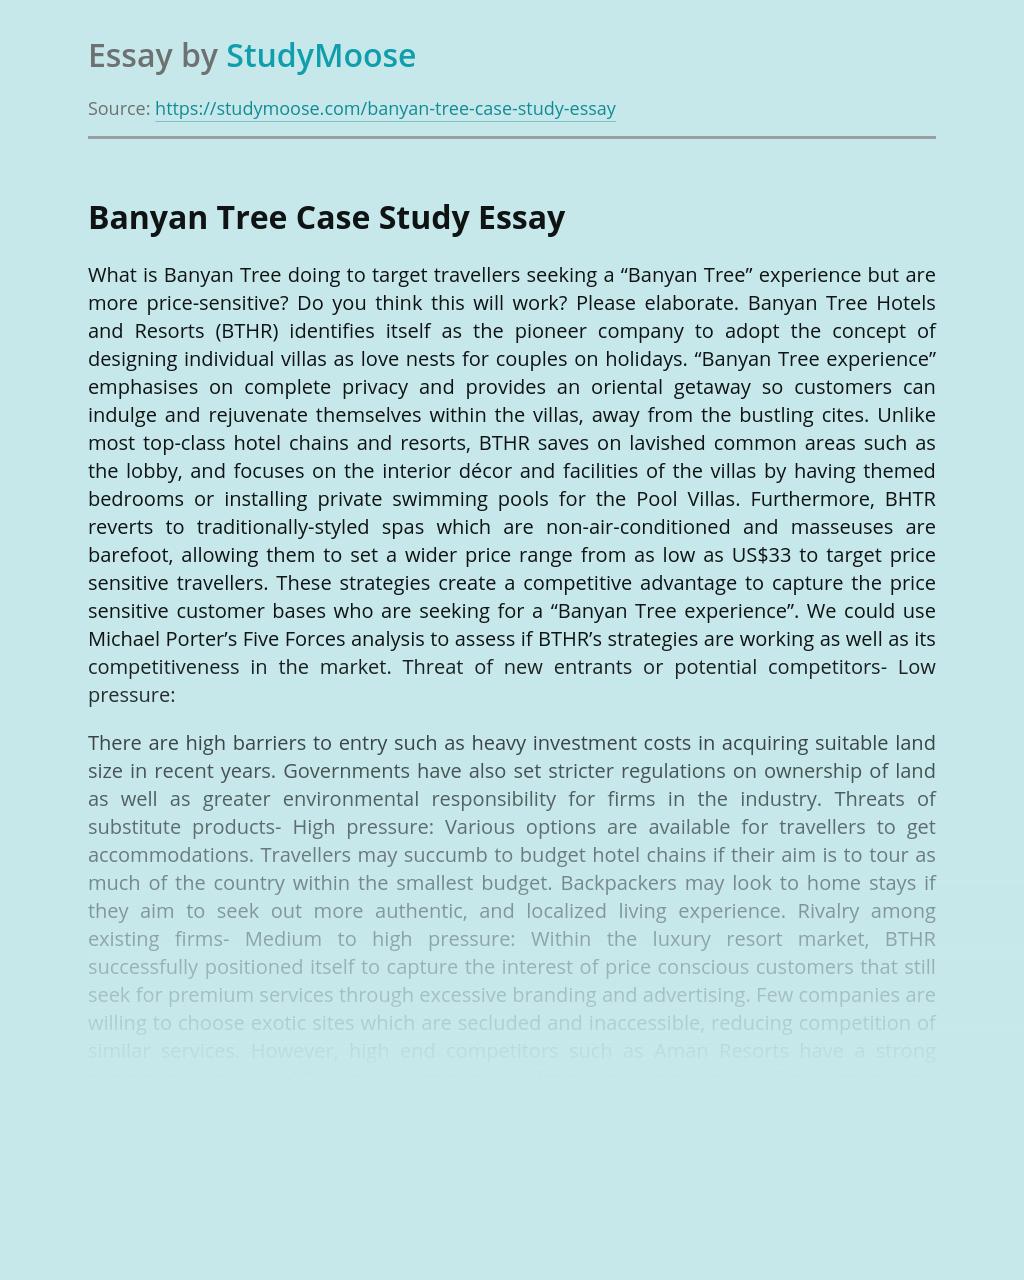 Banyan Tree Case Study